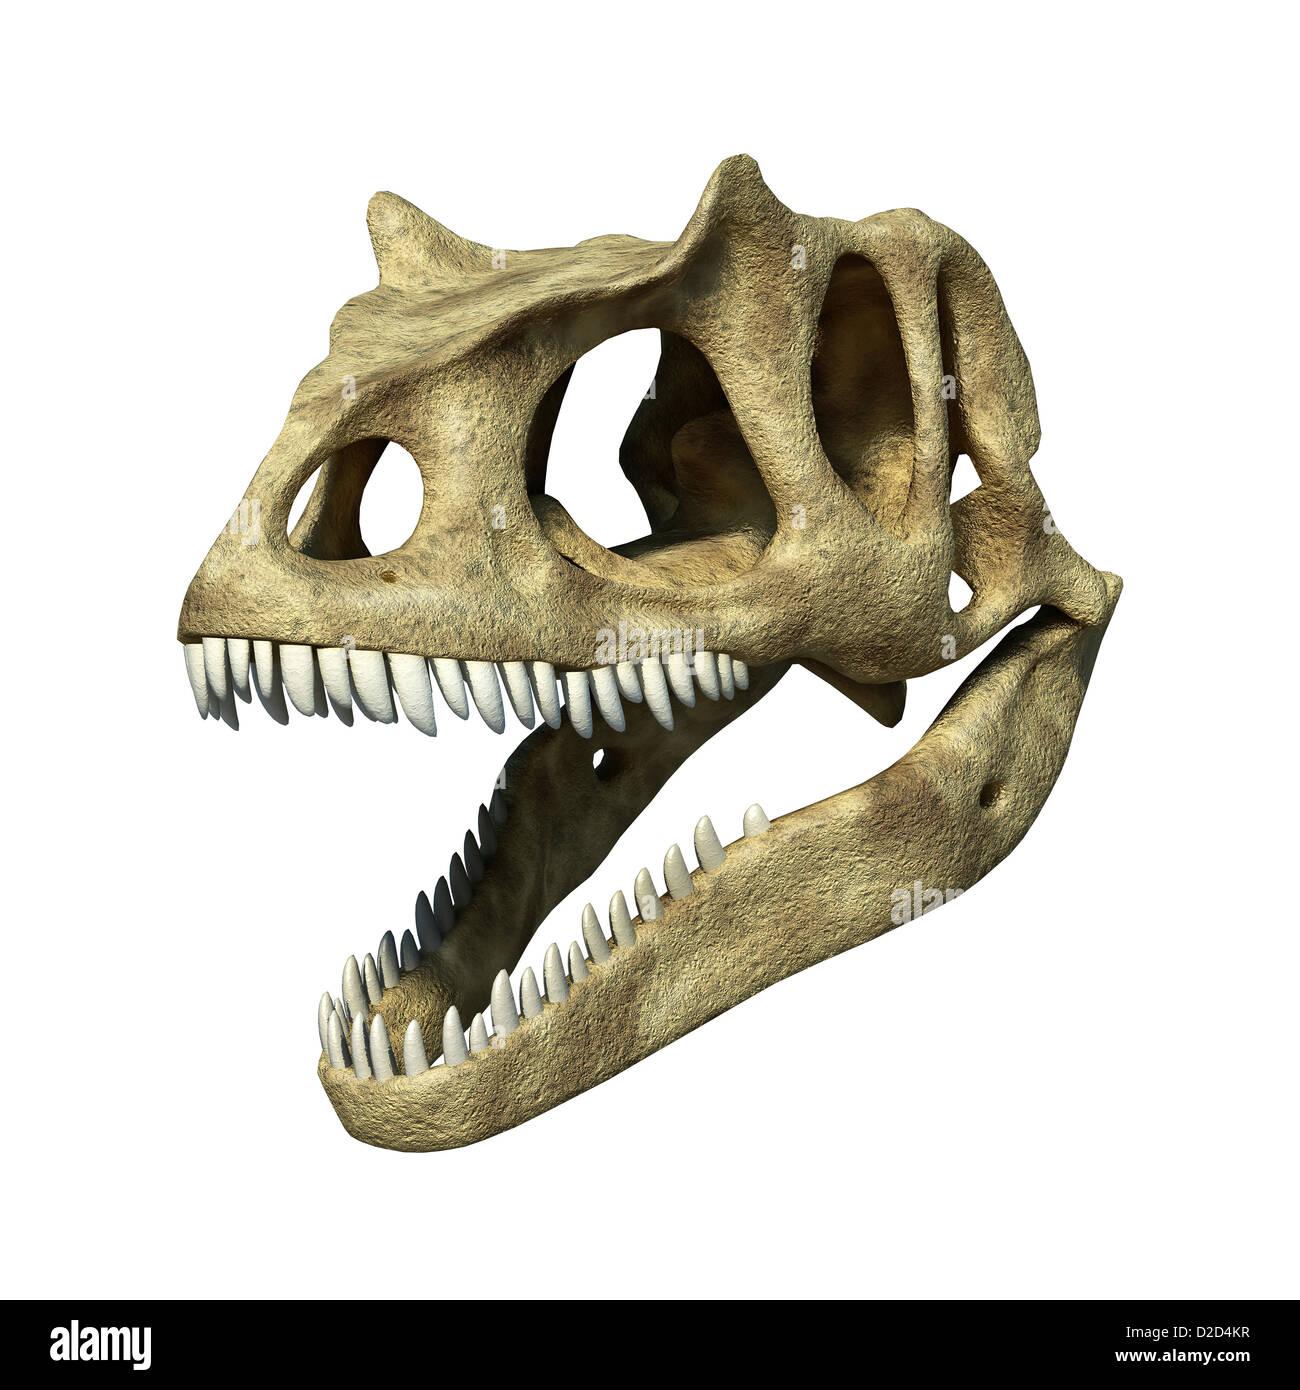 Allosaurus dinosaur skull Allosaurs large carnivorous reptiles late Jurassic period 155 to 145 million years ago - Stock Image